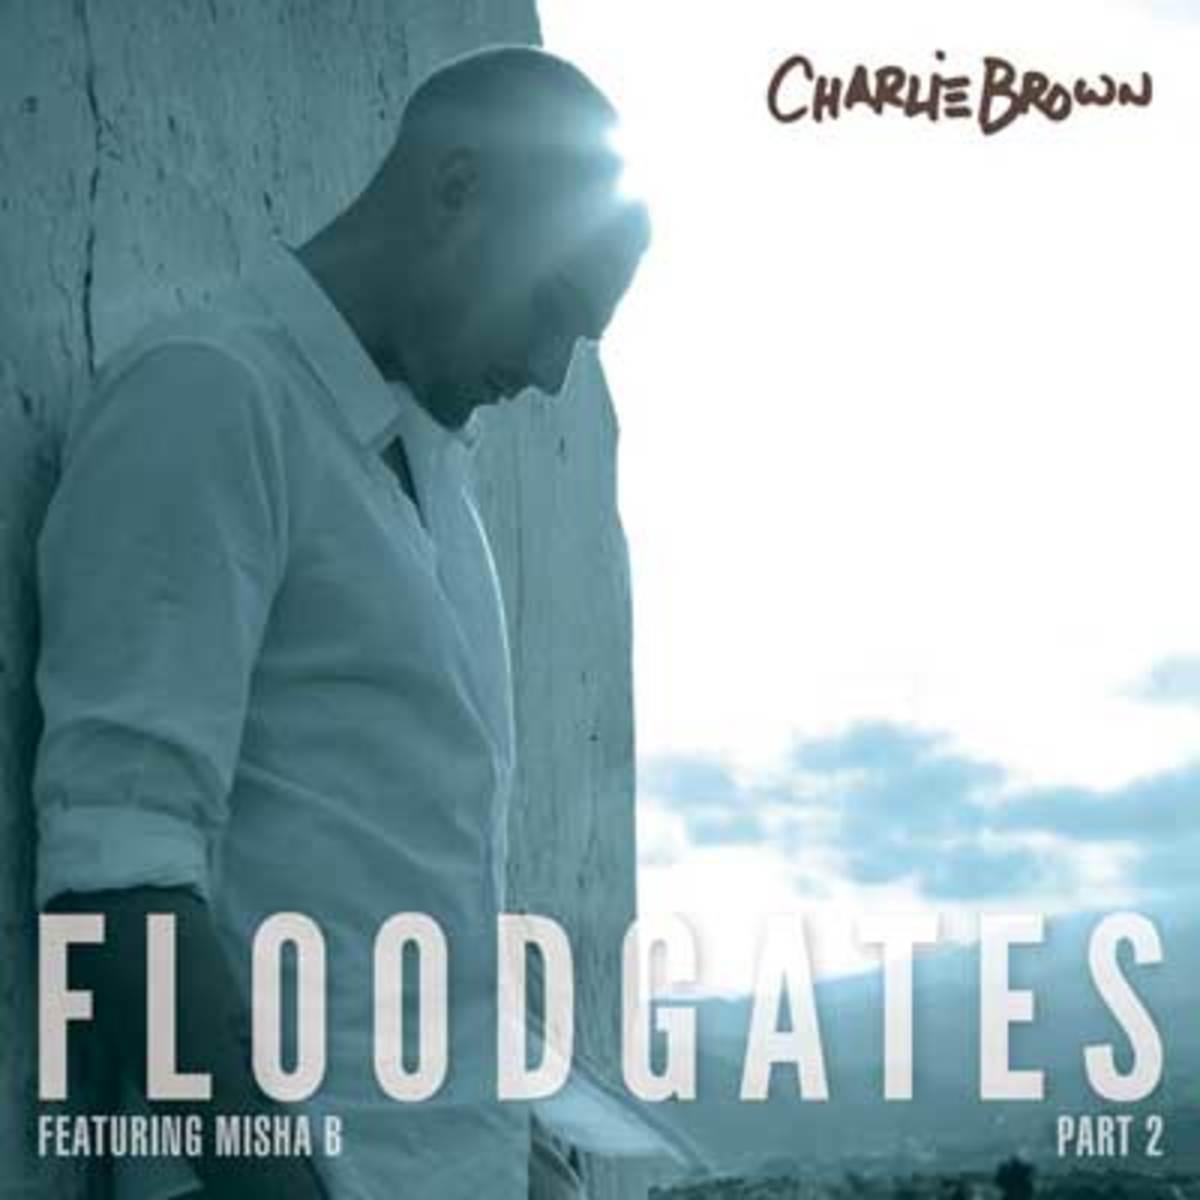 charliebrown-floodgates2.jpg